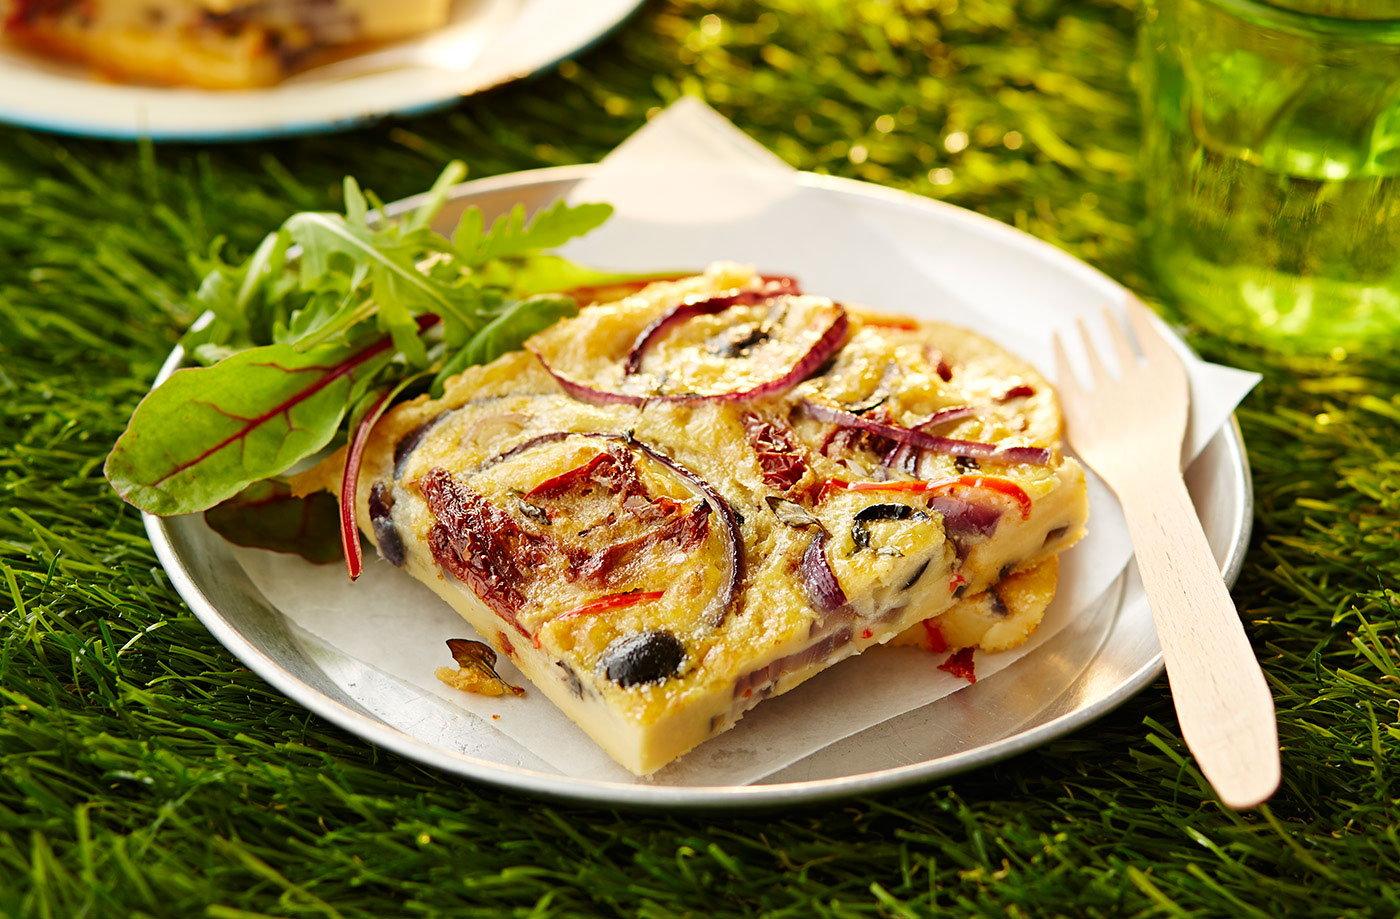 Healthy Picnic Food Picnic Food Tesco Real Food